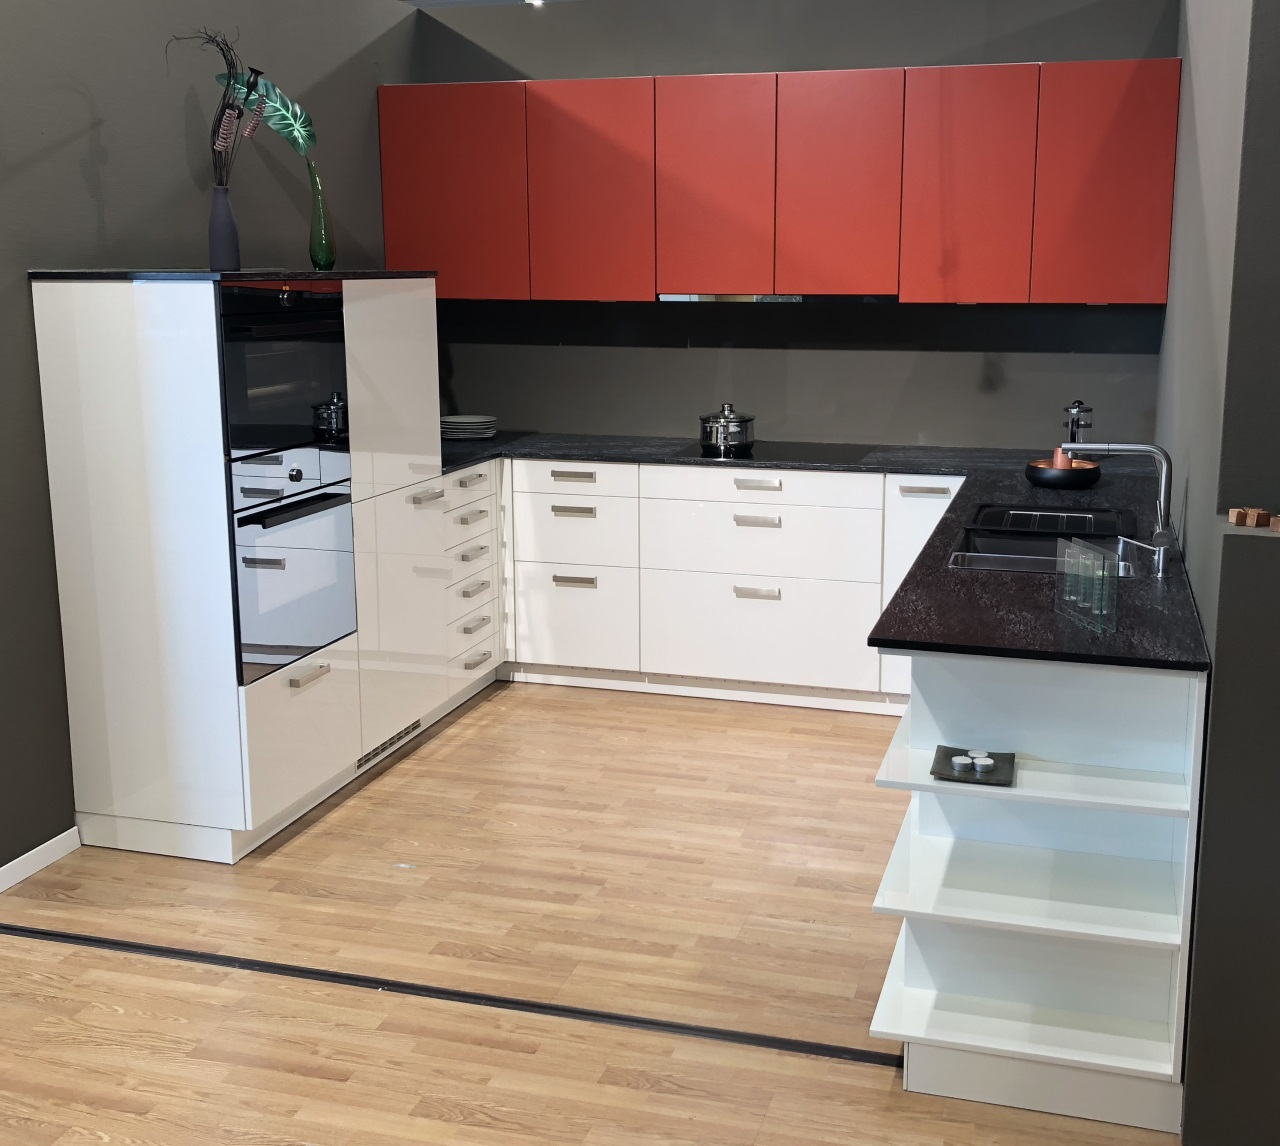 largo fg classic fs ausstellungsschn ppchen k che. Black Bedroom Furniture Sets. Home Design Ideas